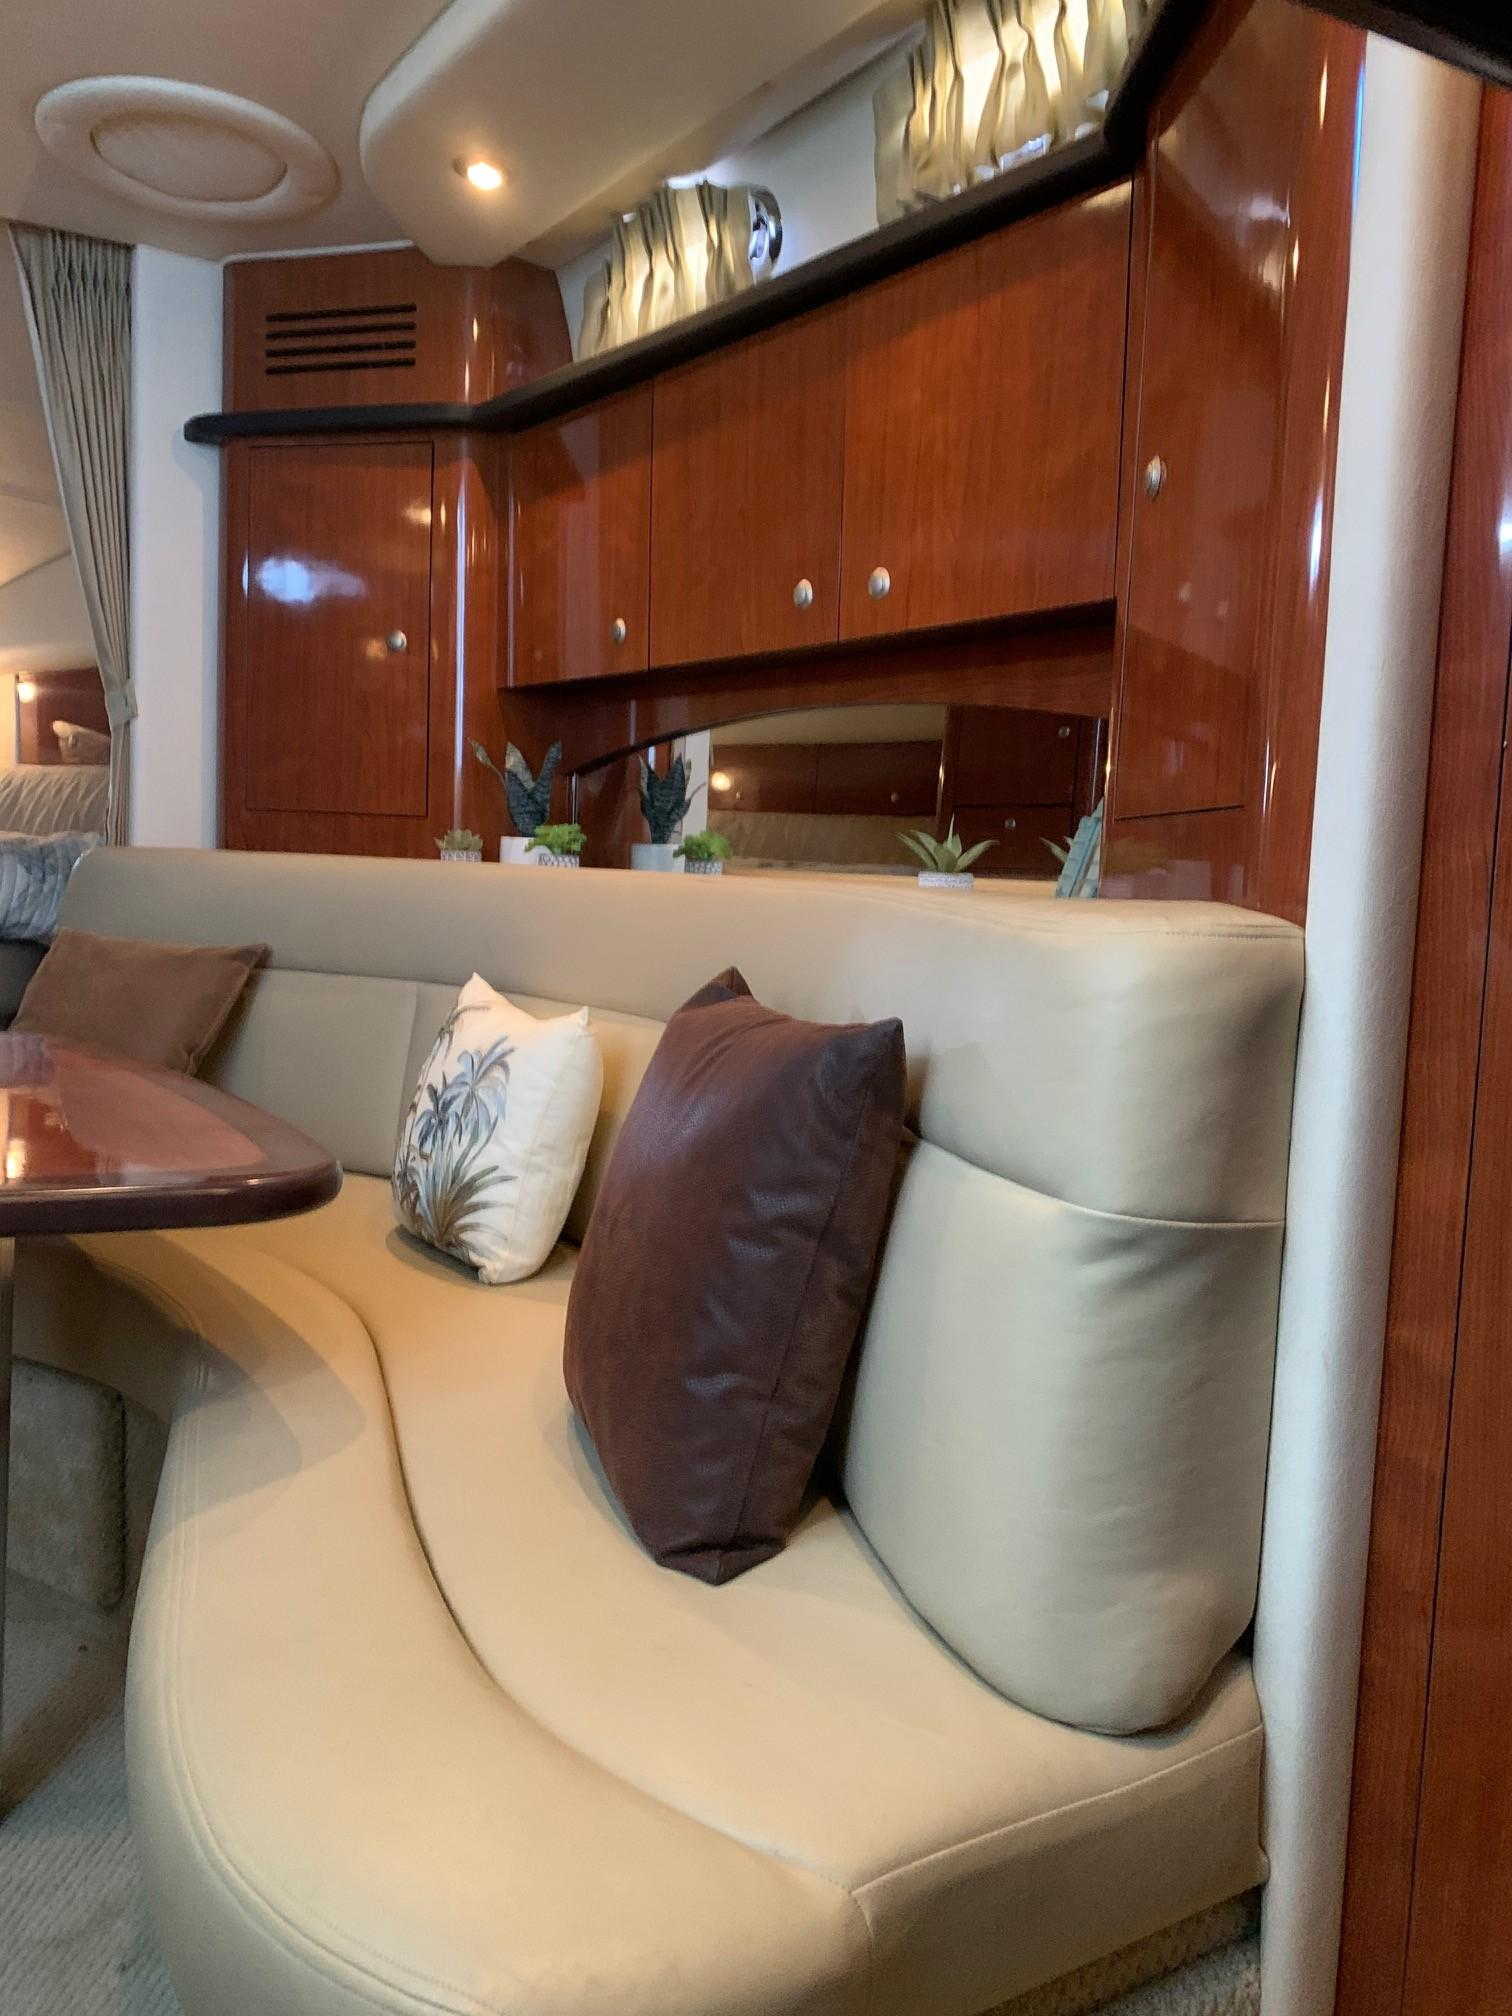 Sea Ray 320 Sundancer - Salon/Dinette Seating